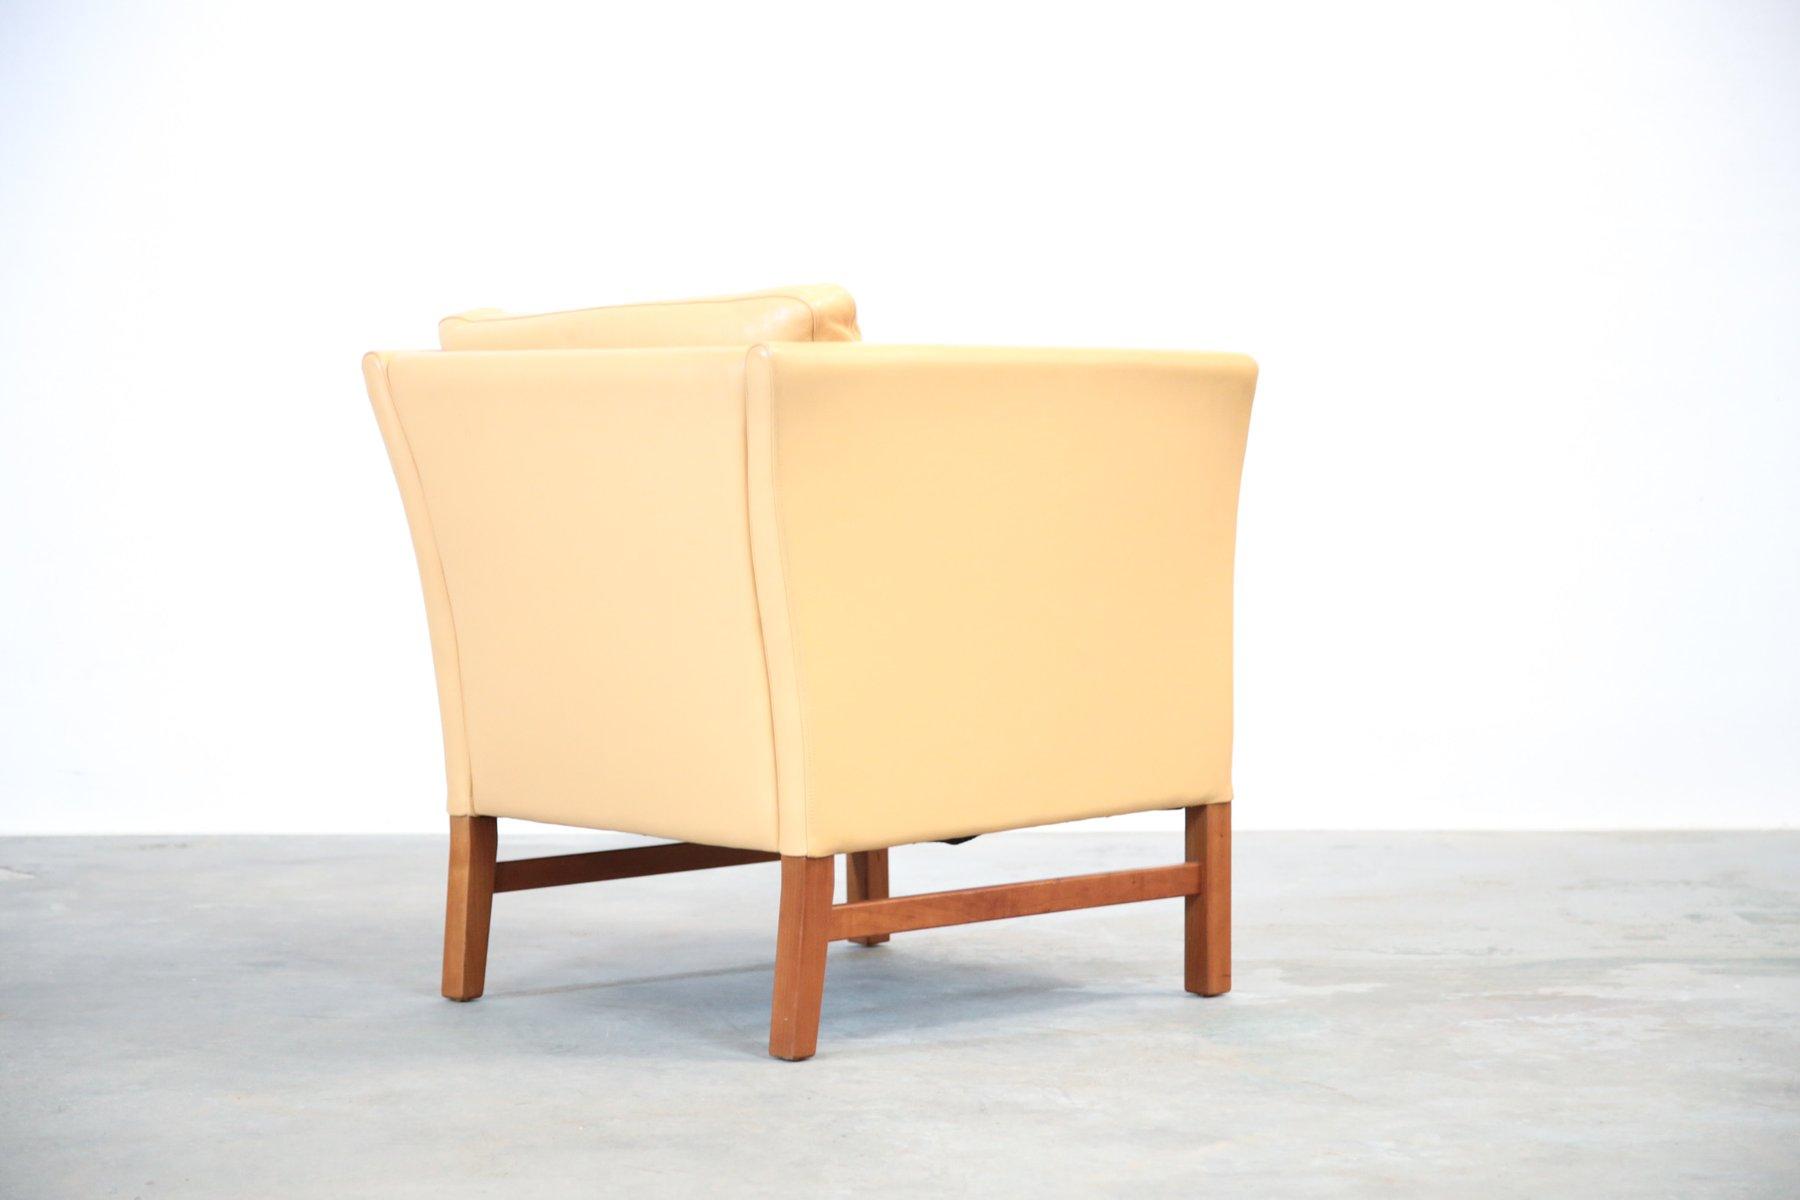 fauteuil beige en cuir danemark 1970s en vente sur pamono. Black Bedroom Furniture Sets. Home Design Ideas